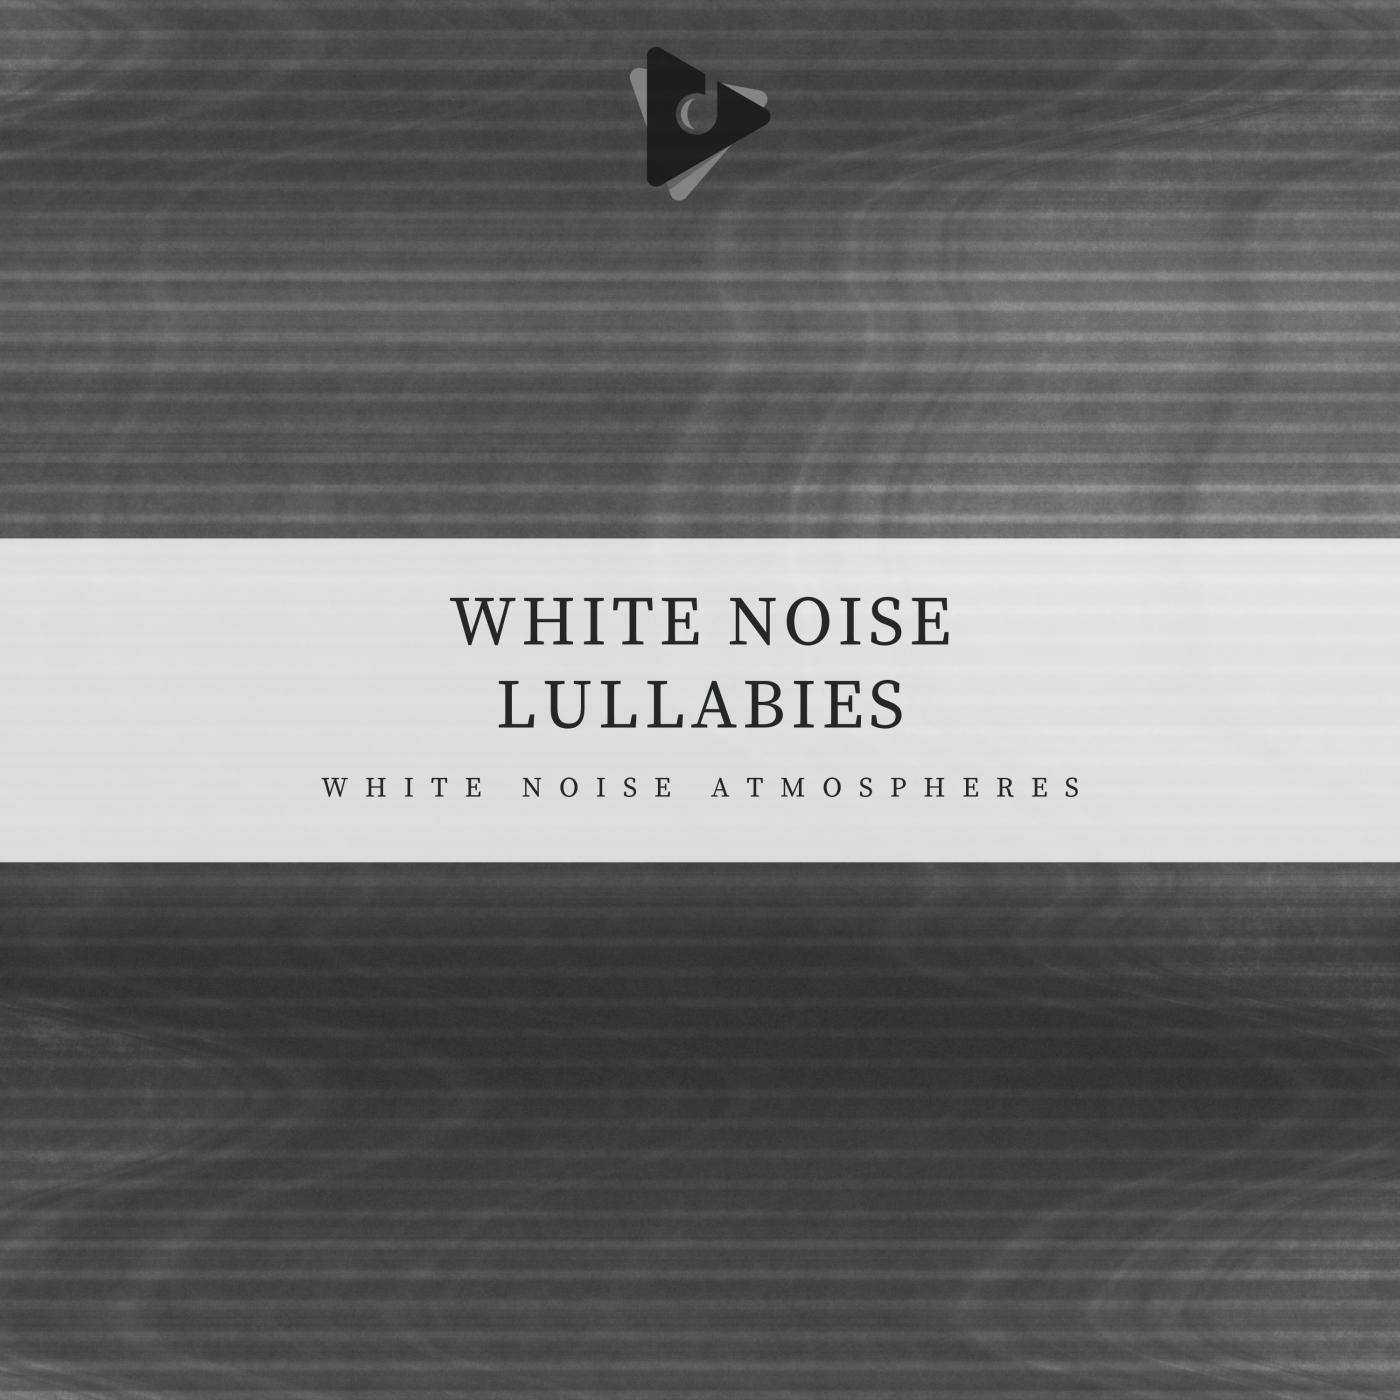 White Noise Lullabies